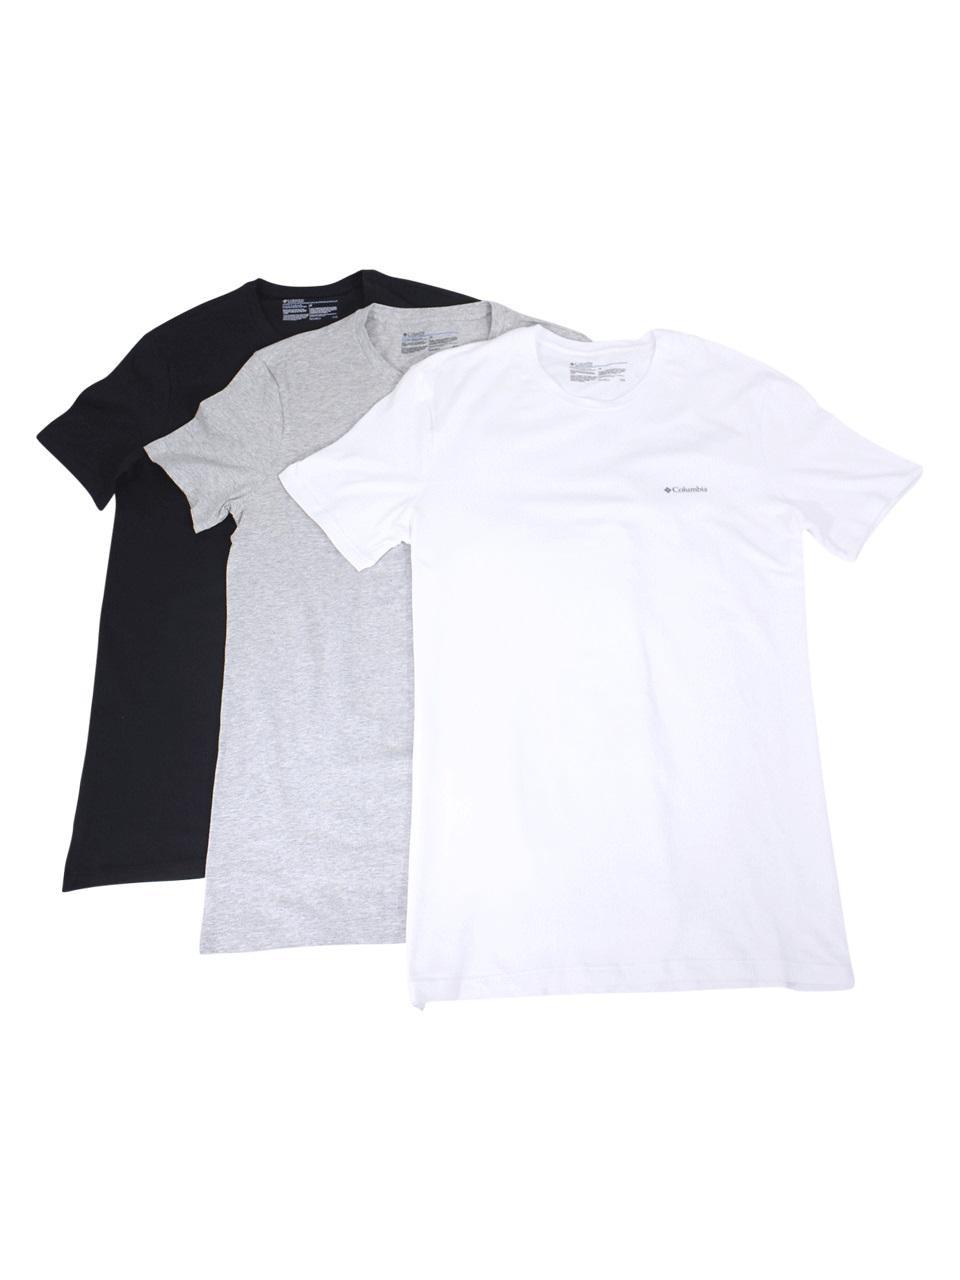 Image of Columbia Men's 3 Pc Short Sleeve Crew Neck T Shirt - Multi - Small